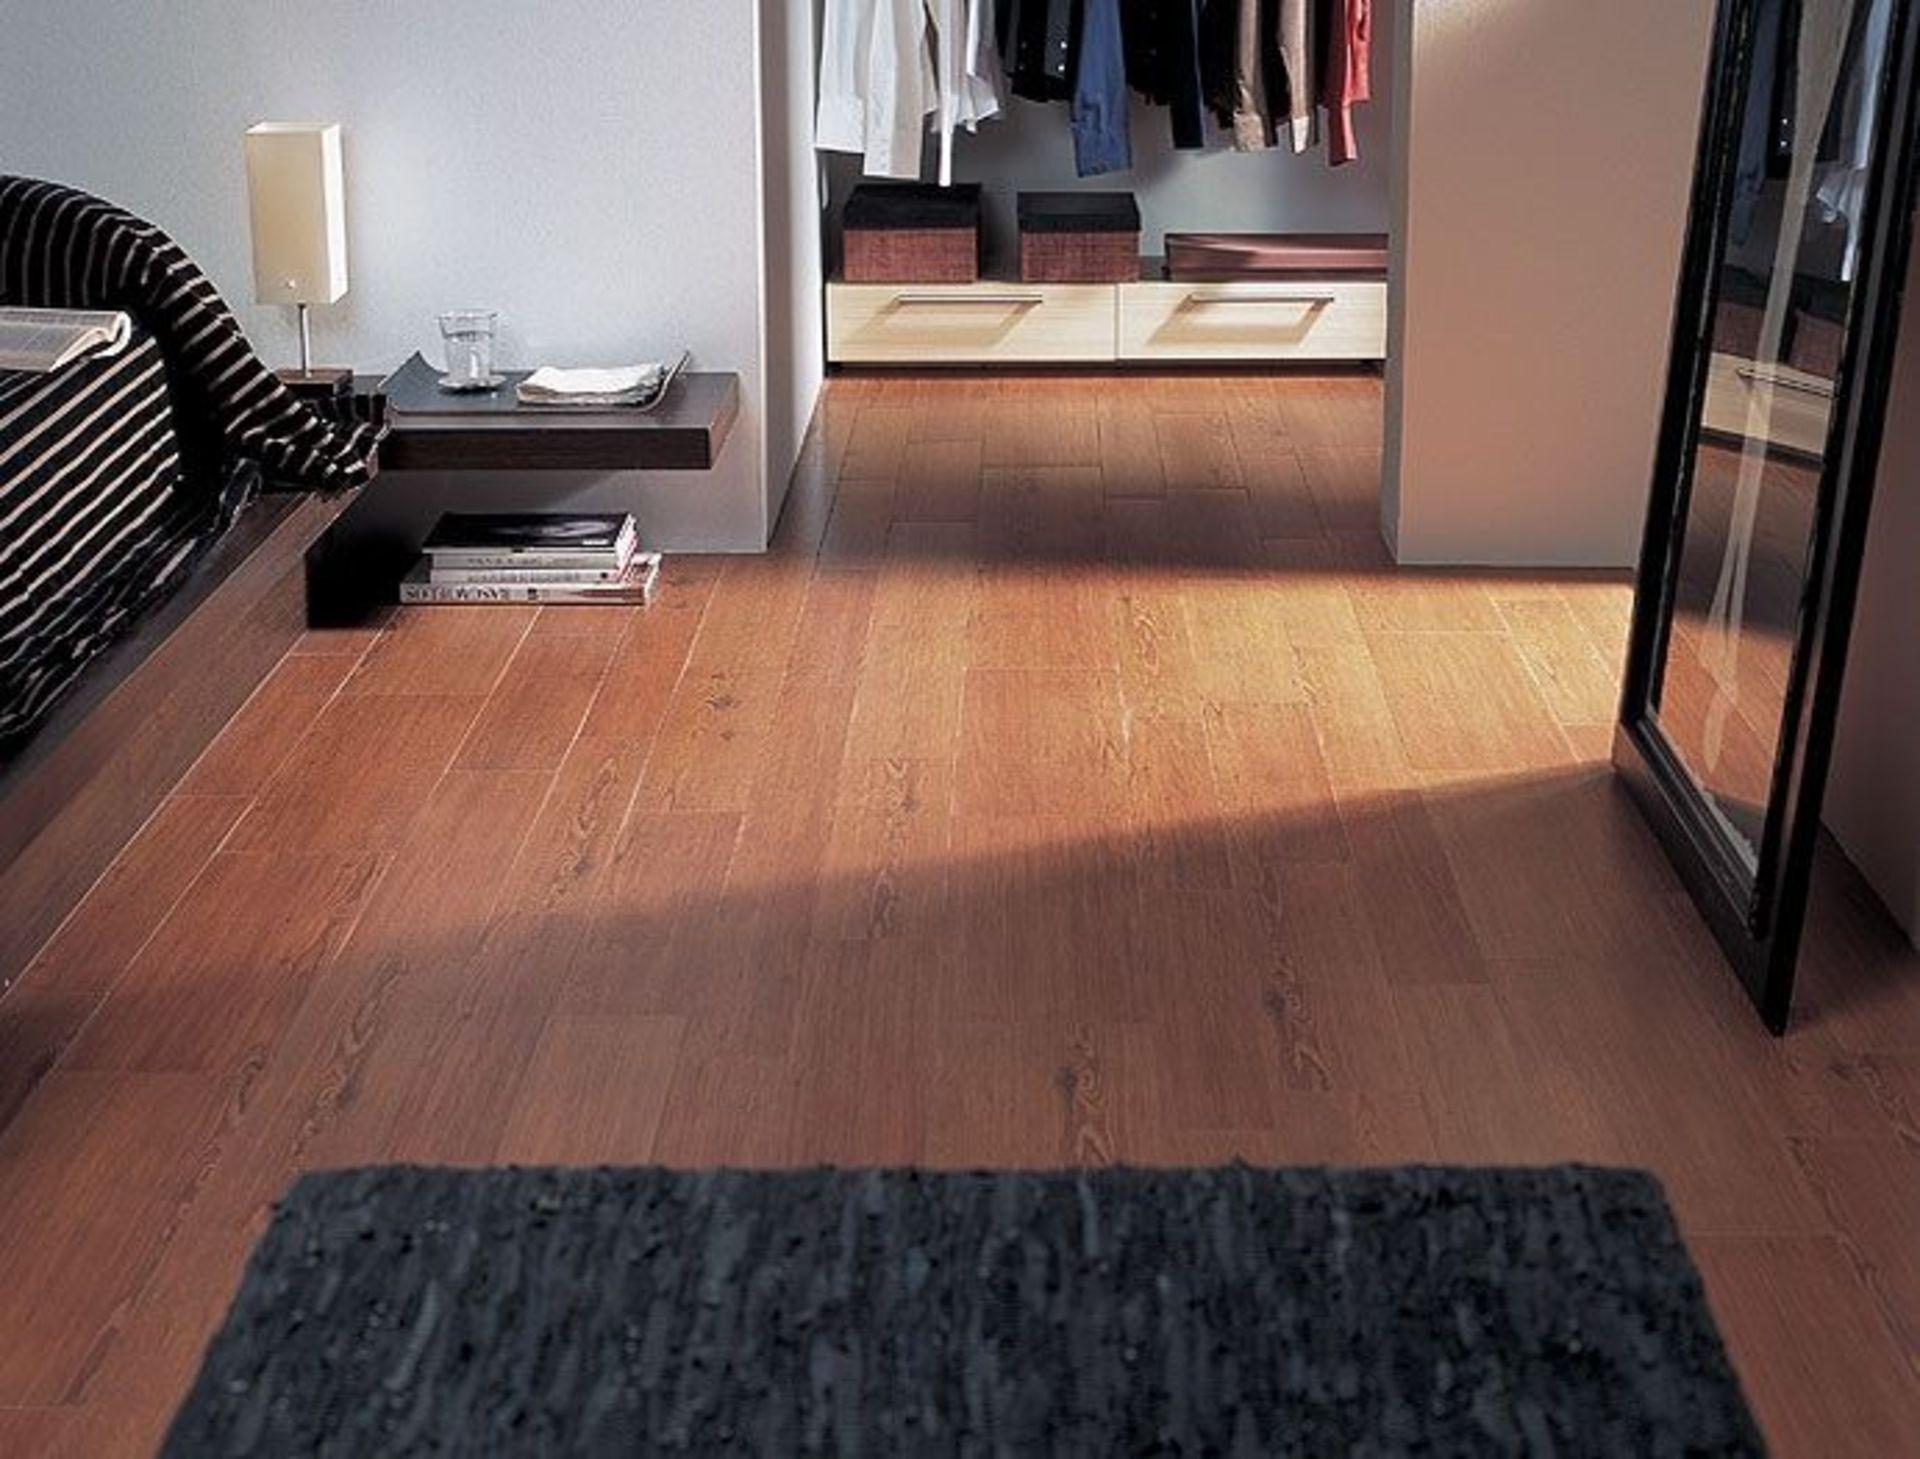 New 10.5M2 Porcelanosa Block Frassino Floor Tiles. 14.5x66Cm Per Tile, 1.05M2 Per Pack. With A